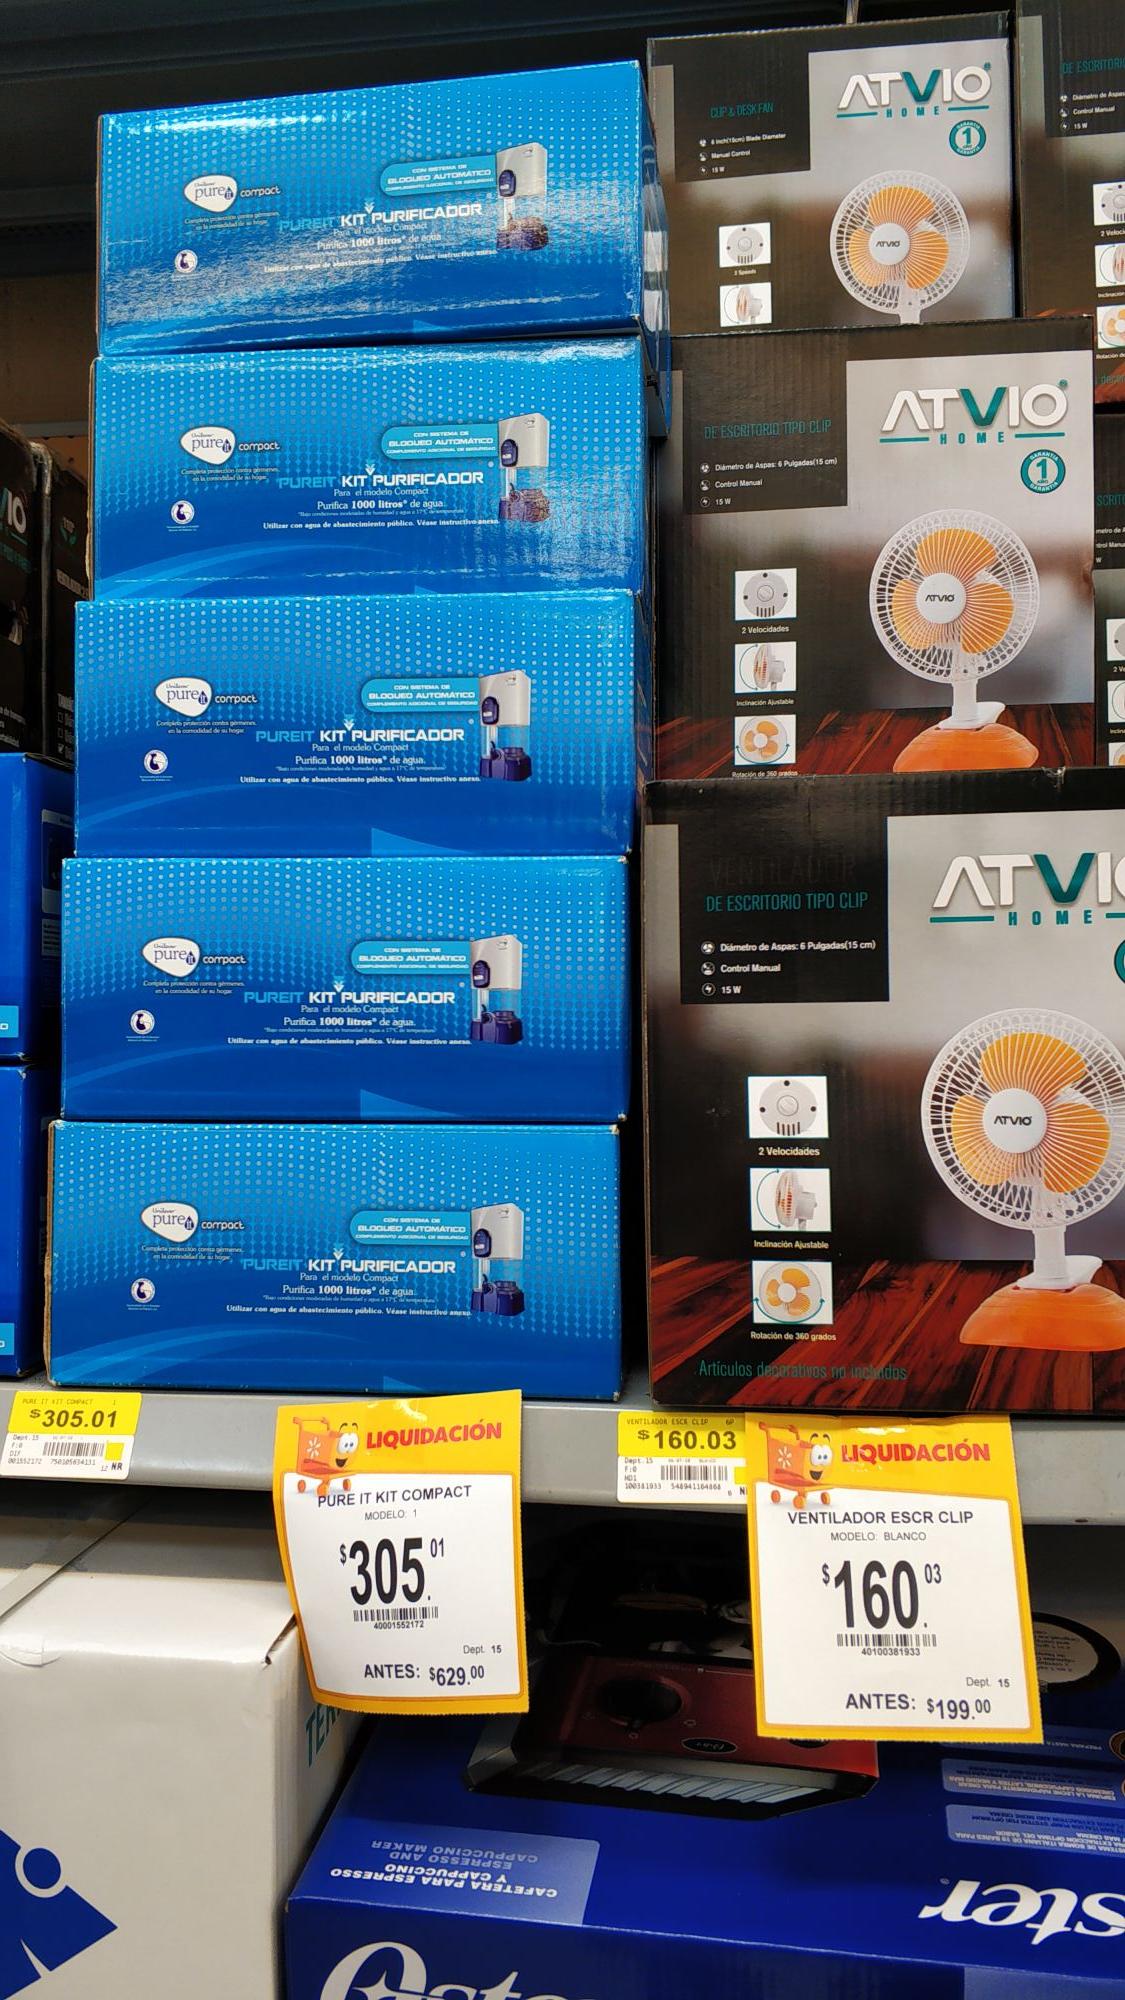 Walmart: Kit pure it .repuesto purificador.